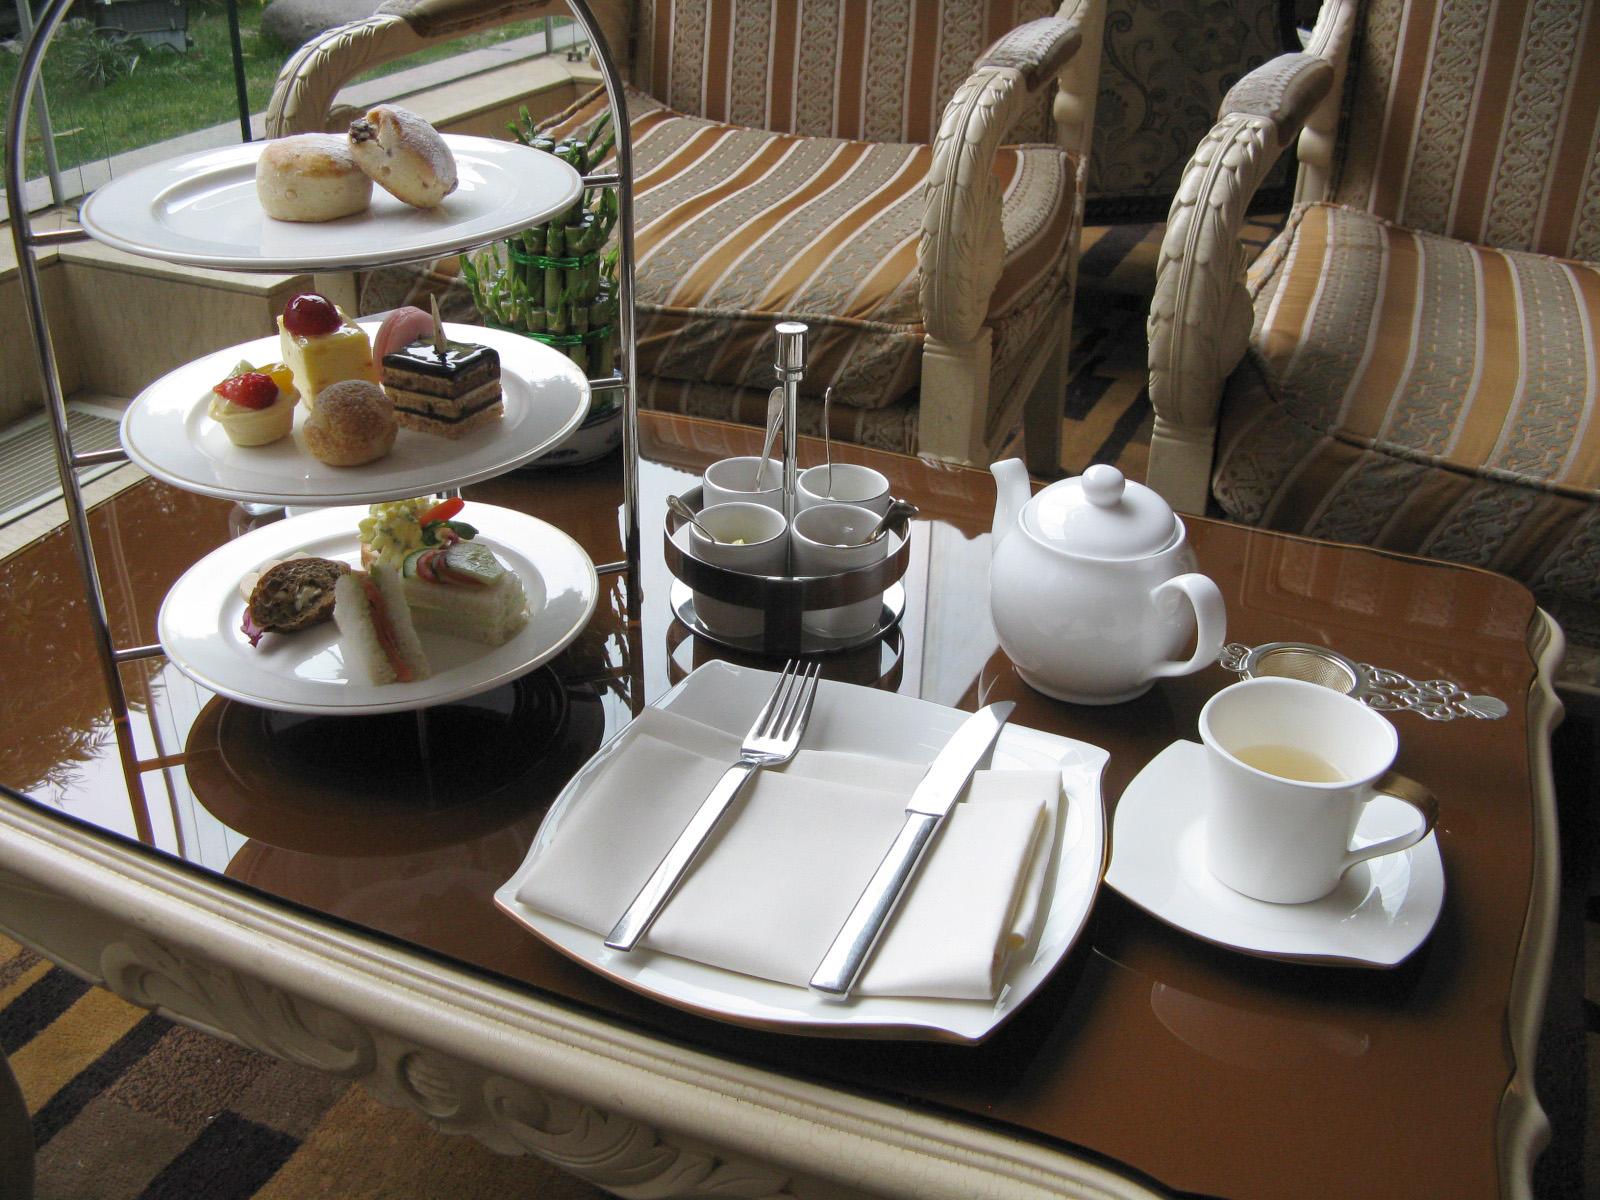 tea table settings tables - photo #15